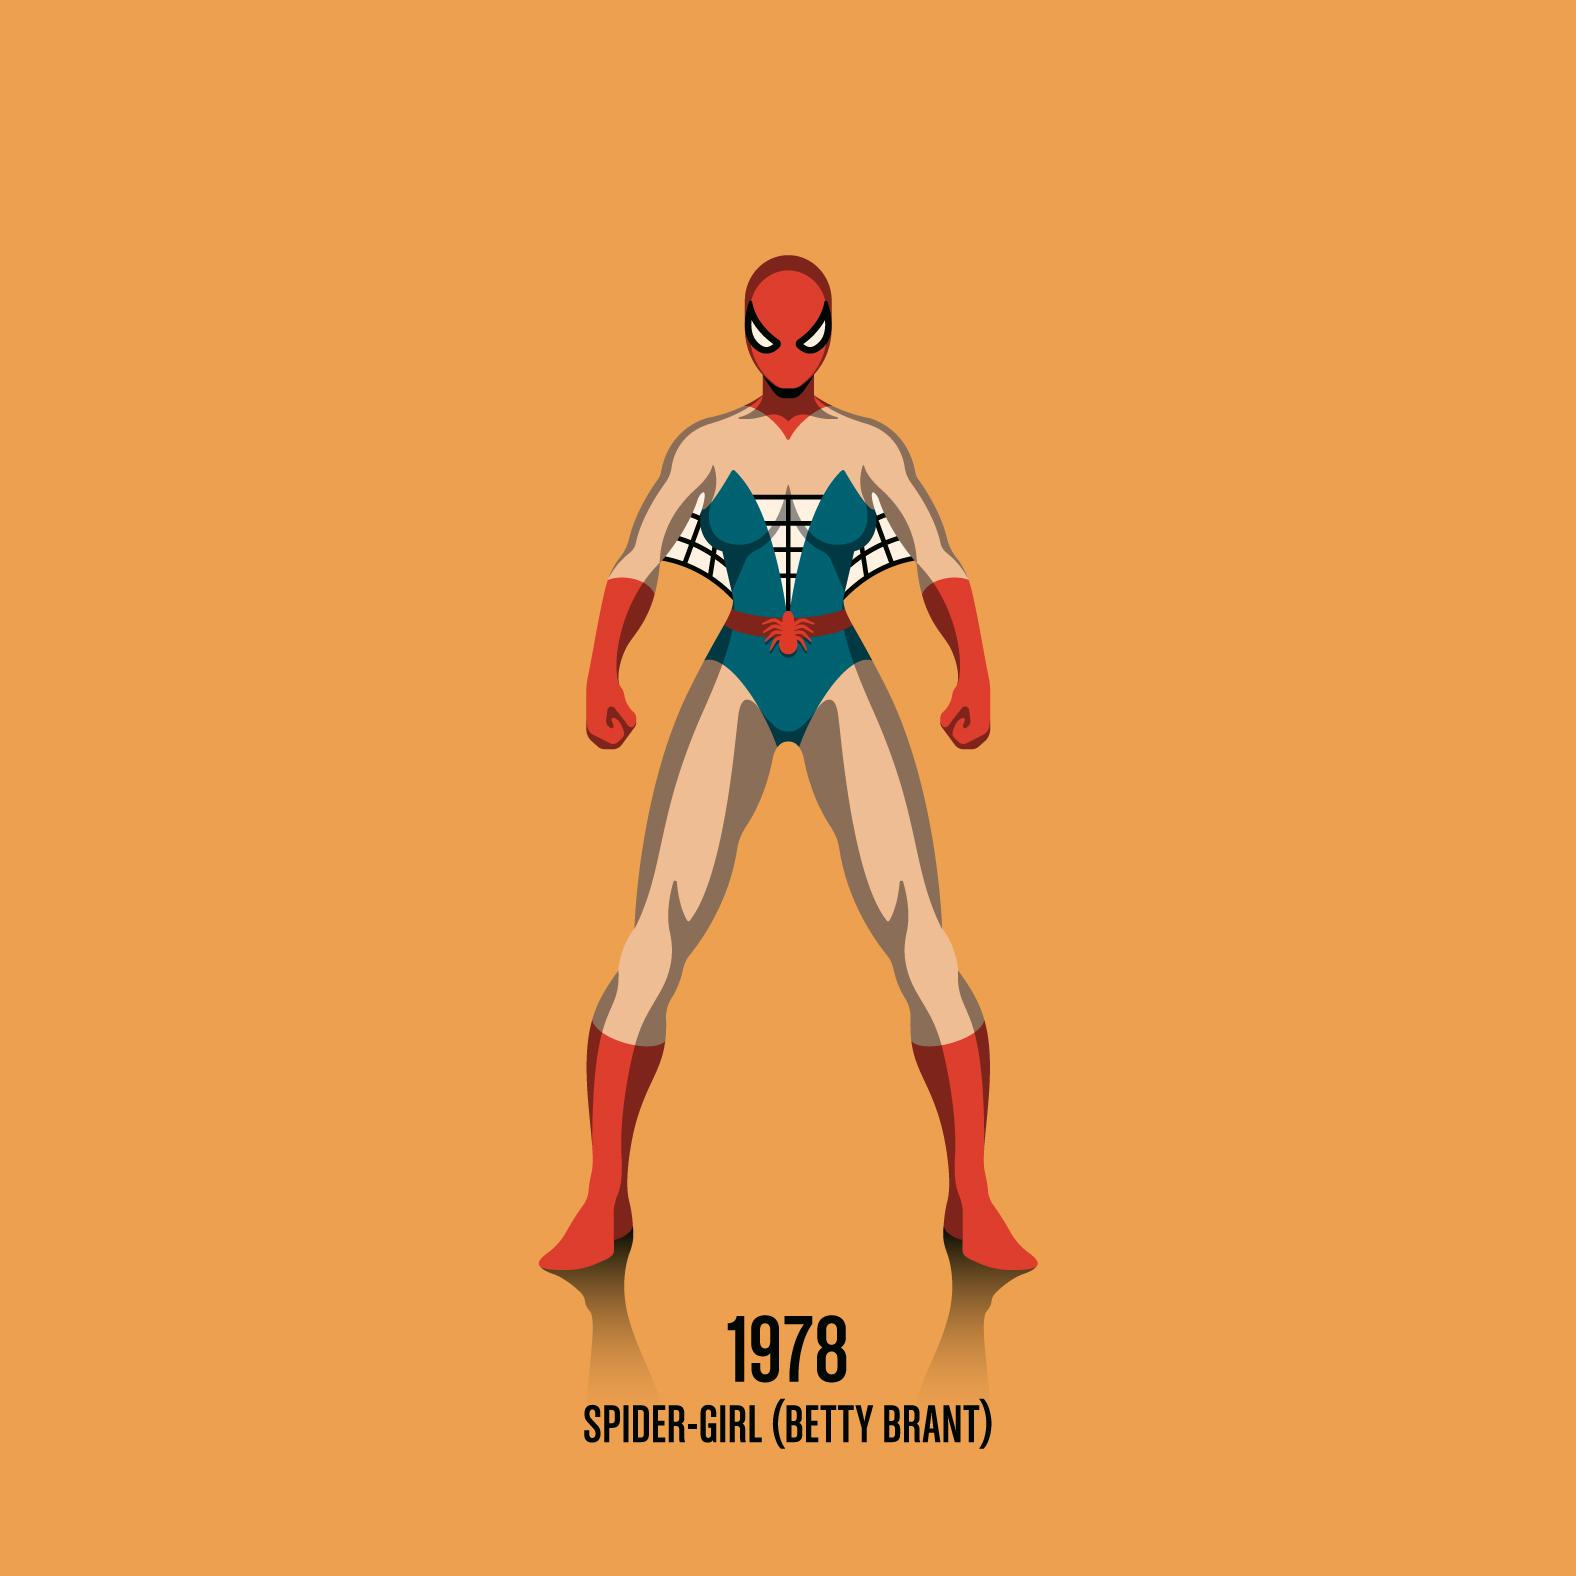 1_spiderman-13-.jpg